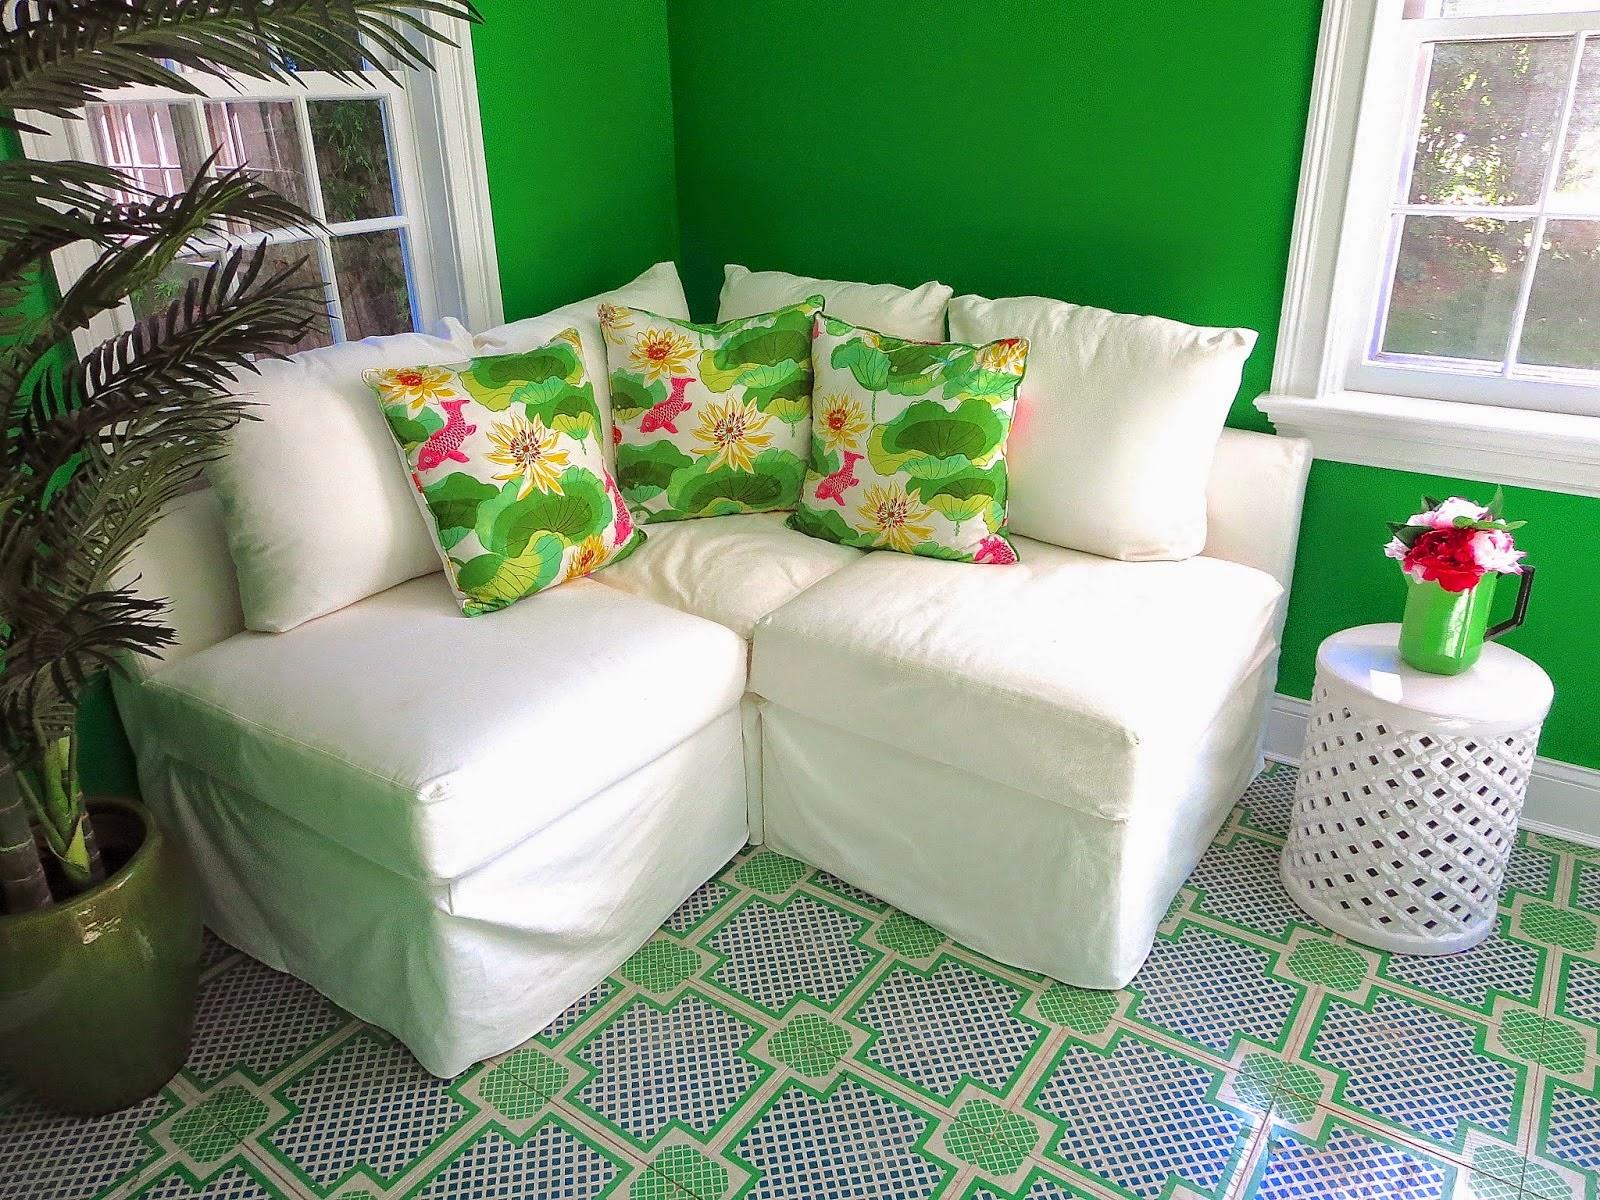 Mirth studio colorful patterned hardwood floor tiles for Garden room flooring